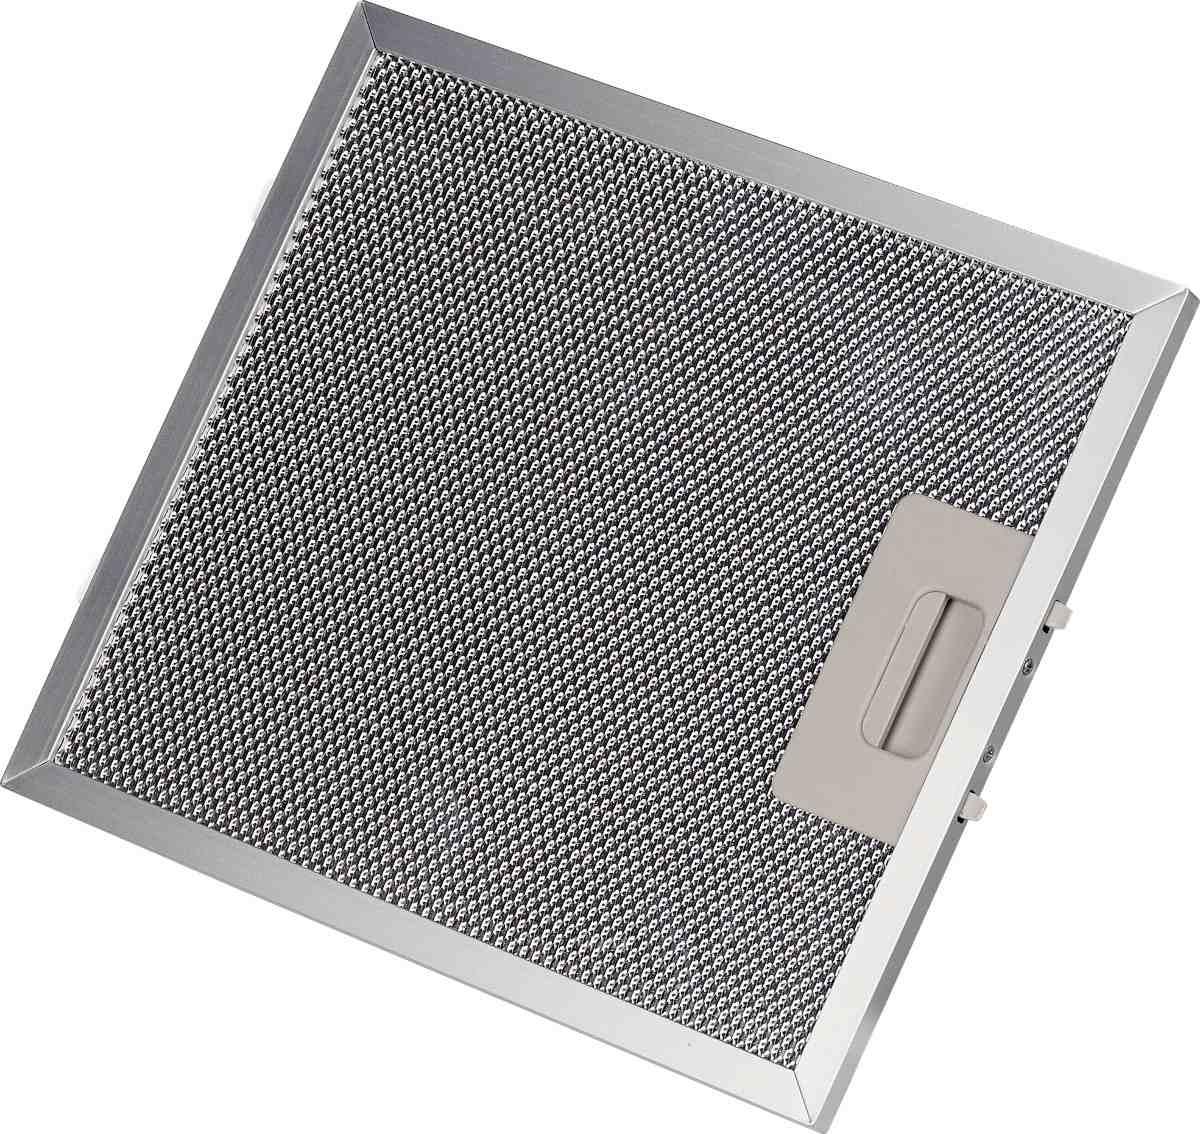 Tela Filtro Coifa Suggar Inox 90cm Piramidal 268 X 373mm  - HL SERVICE